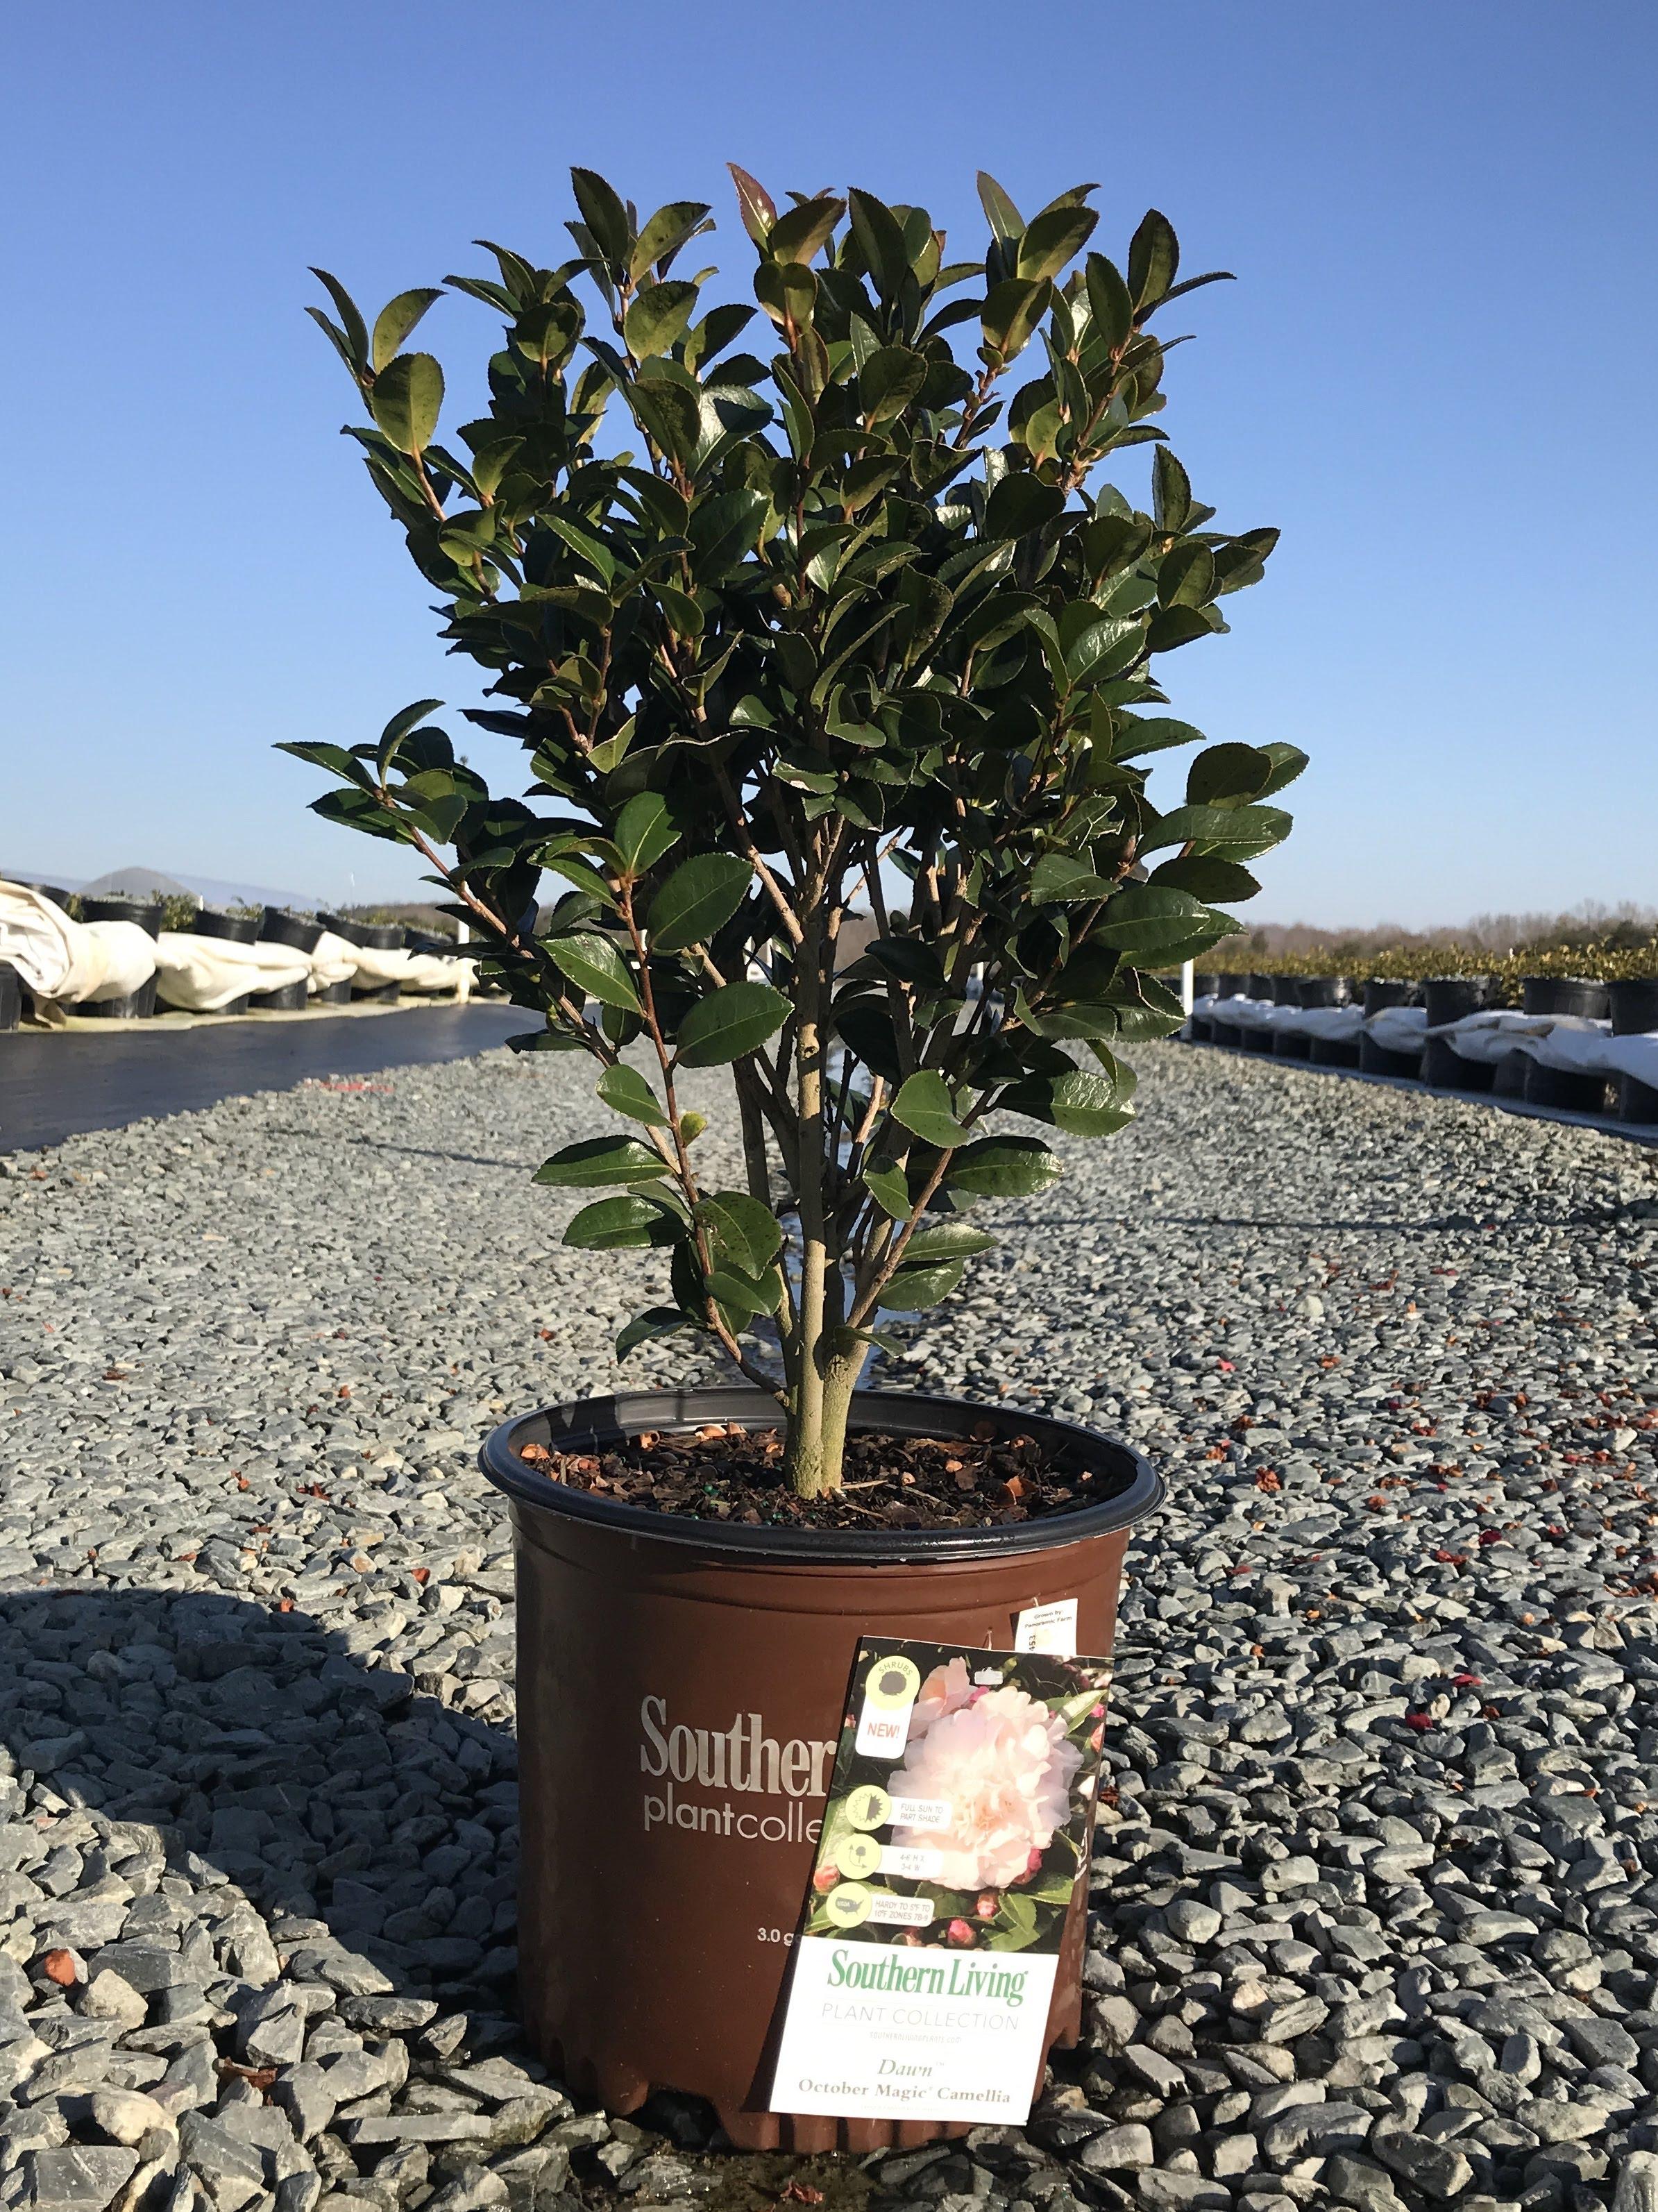 Camellia sasanqua, October Magic Dawn 3 gallon